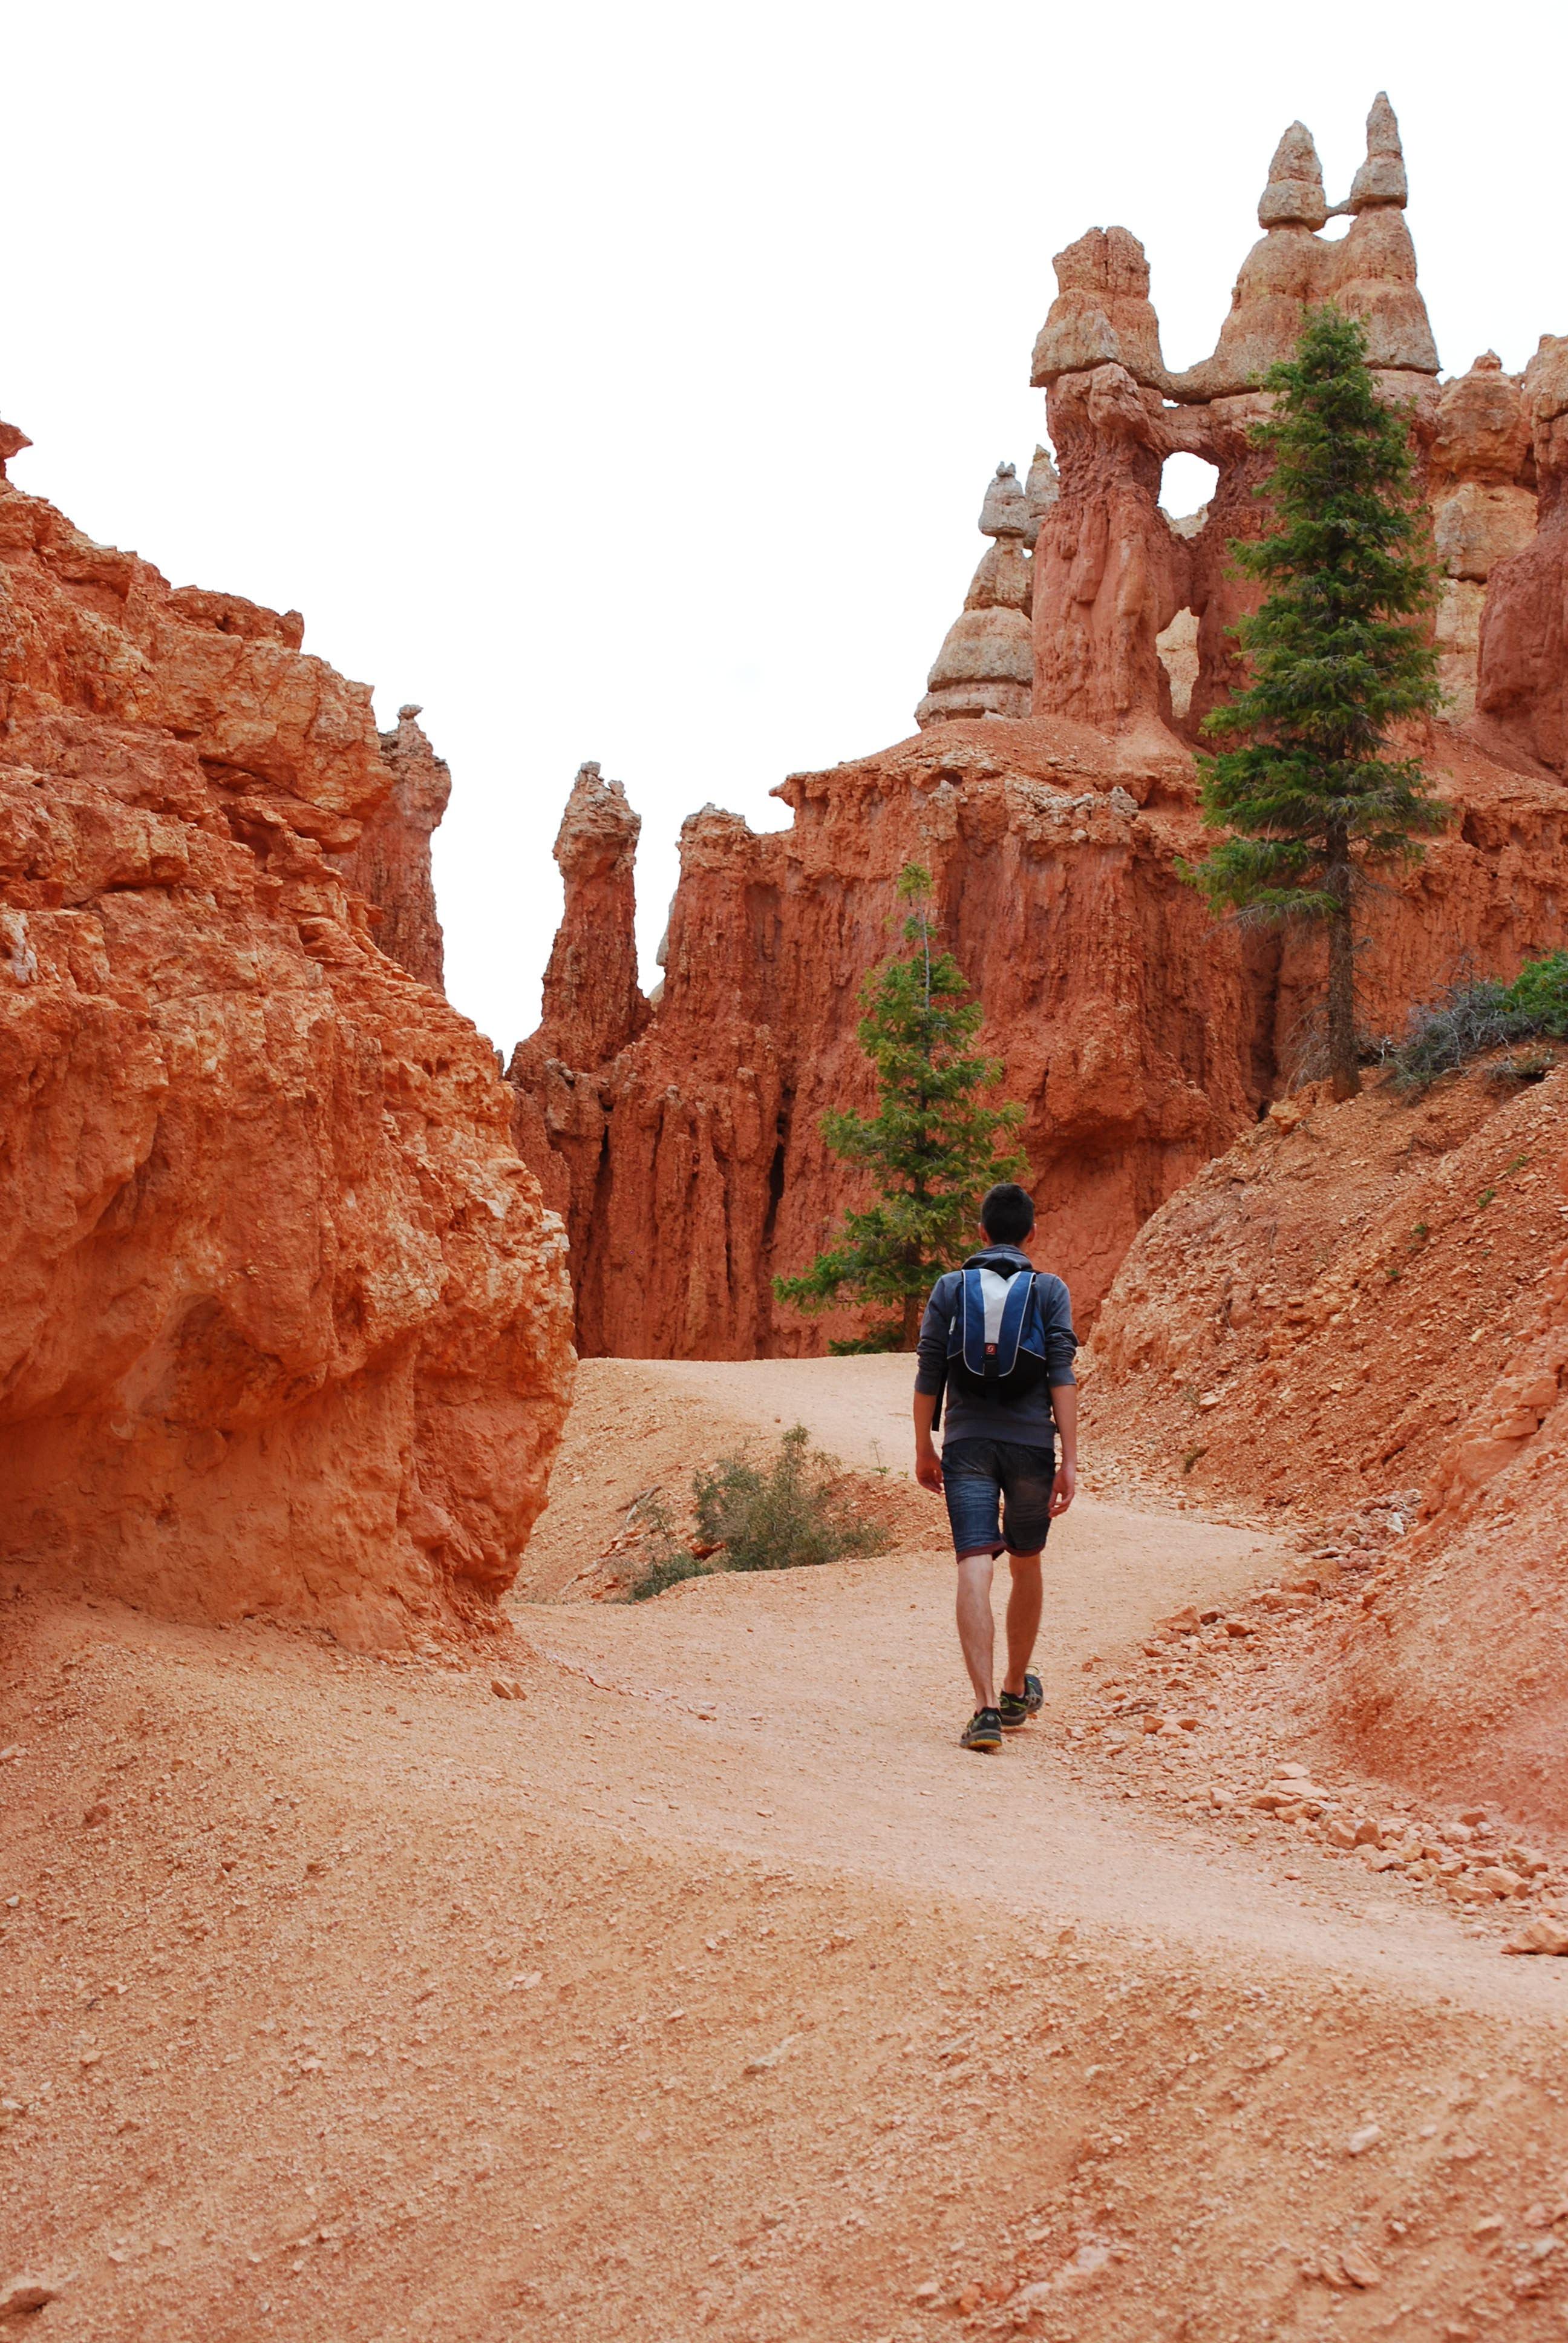 man walking on road between rock formation mountains